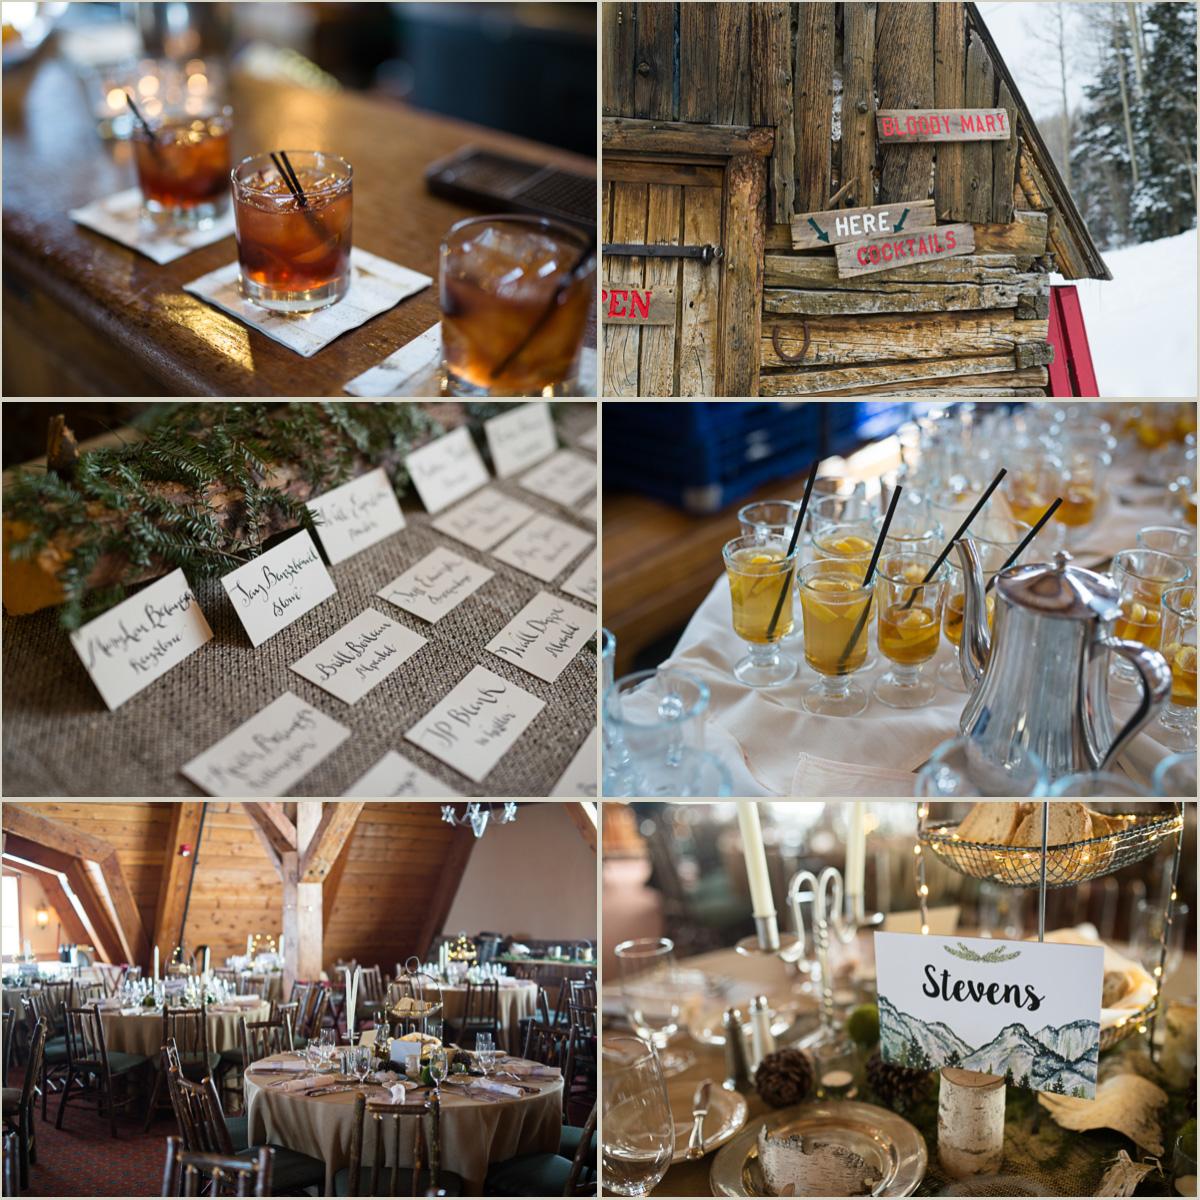 Rustic Ski Lodge Wedding Details